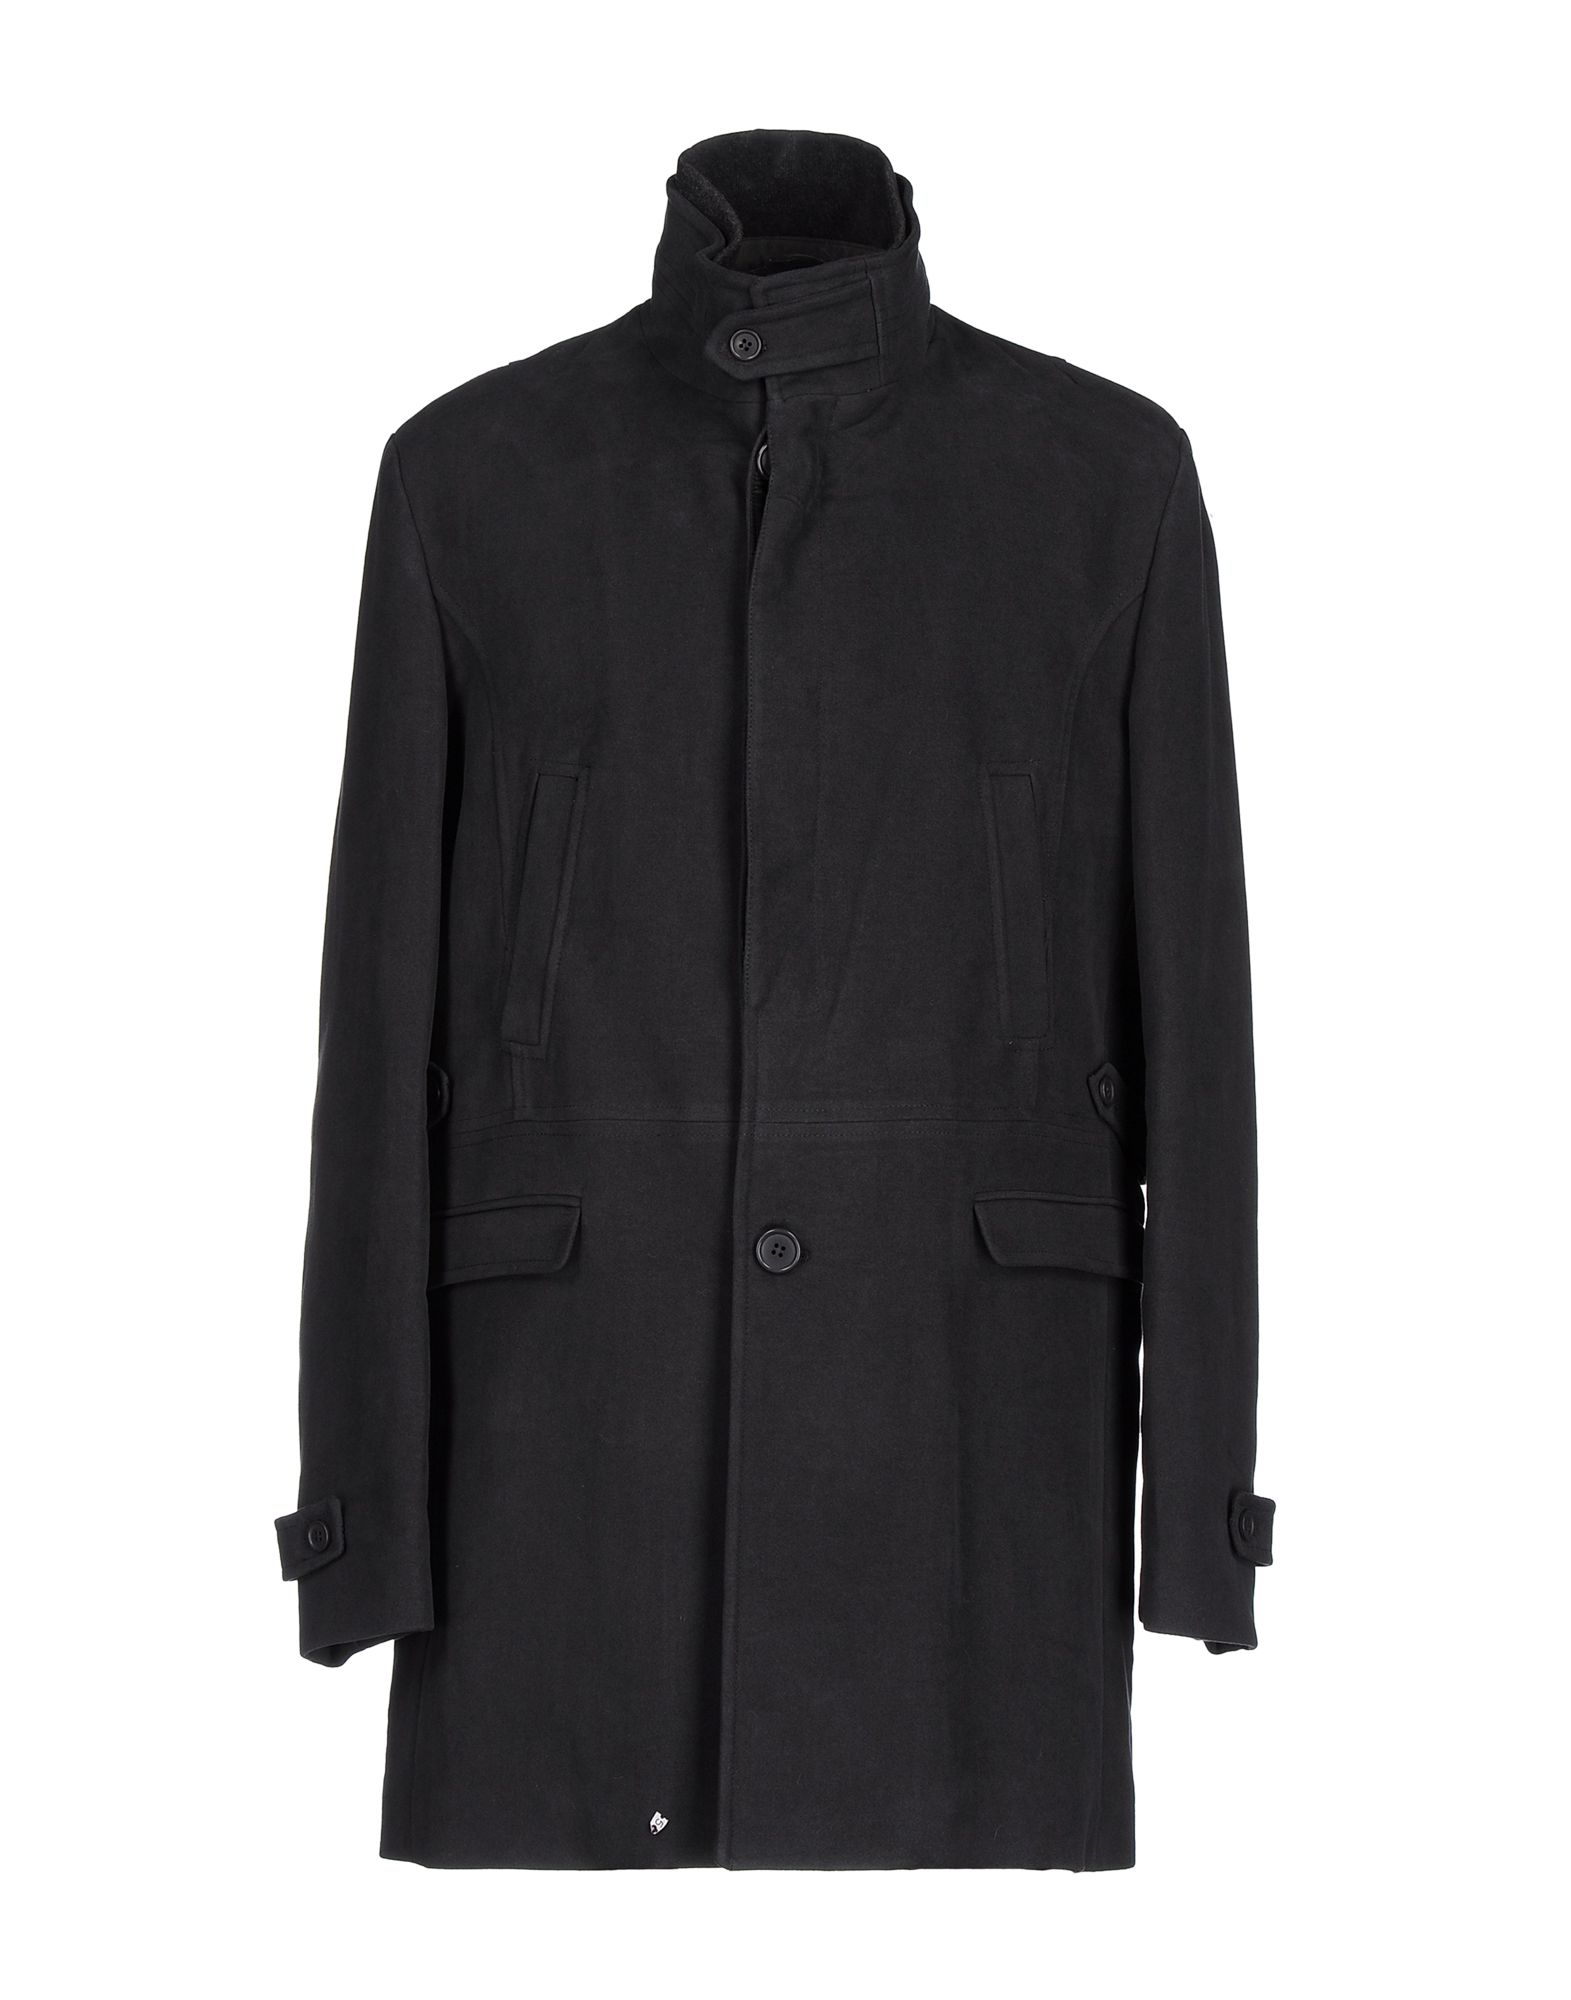 DAMA Coats in Steel Grey